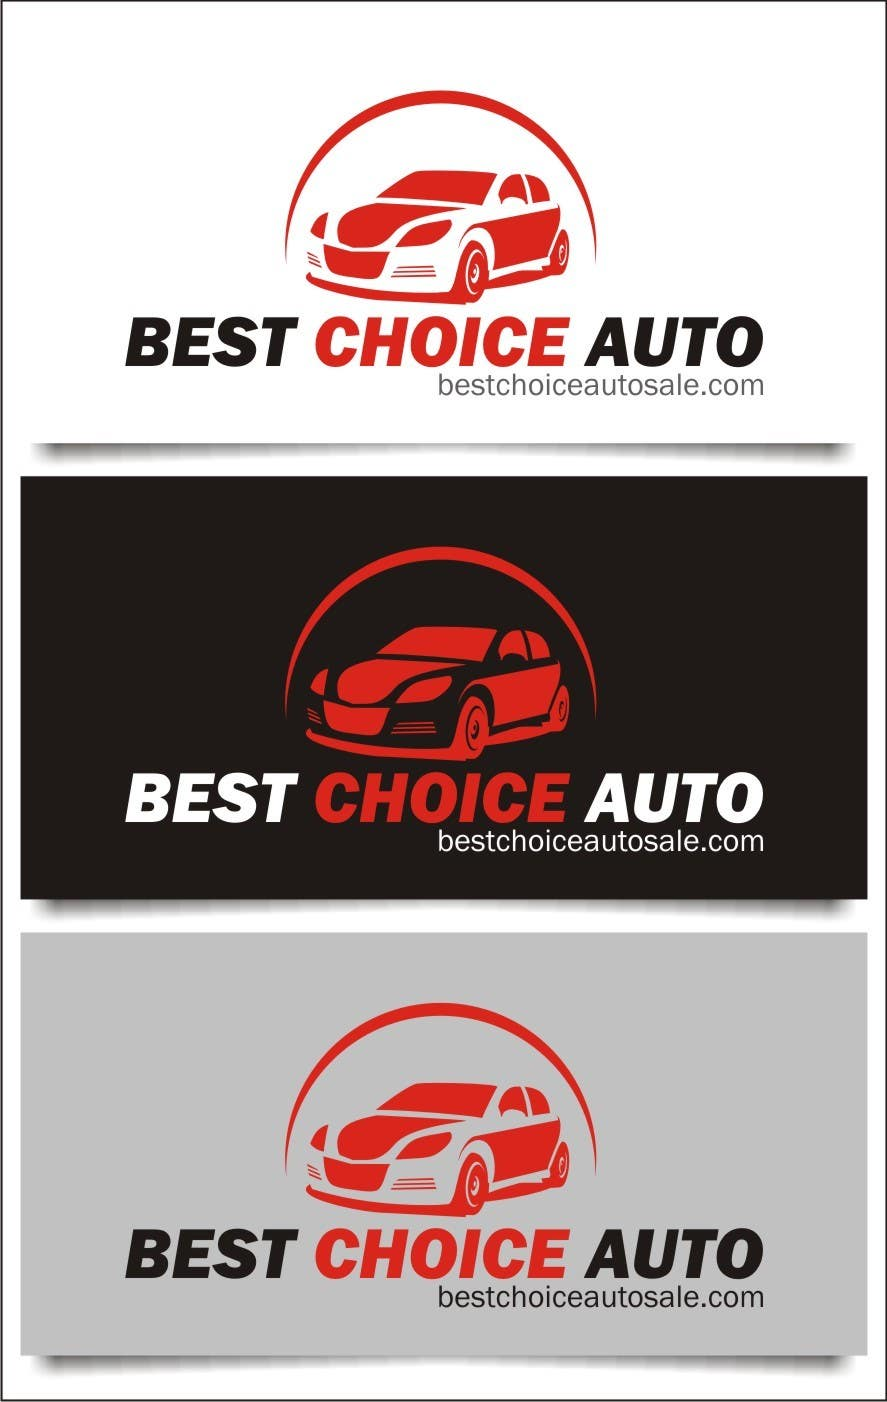 Penyertaan Peraduan #20 untuk Design a Logo for Best Choice Auto